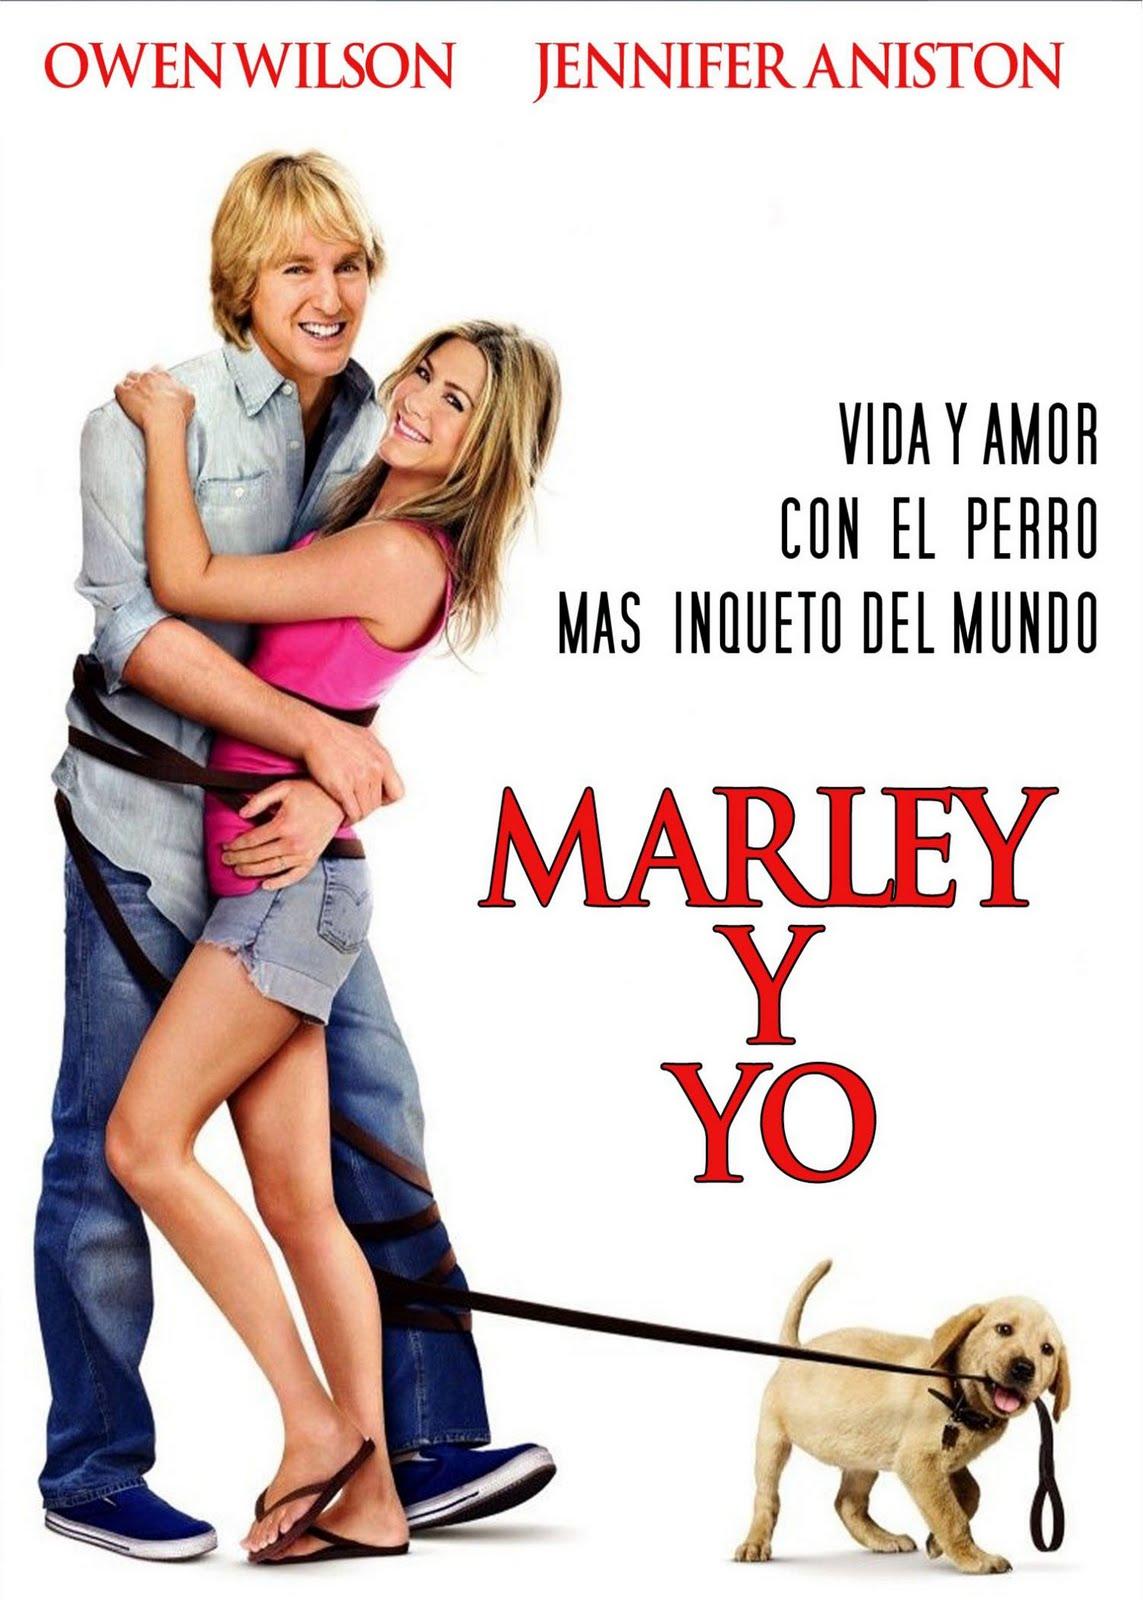 http://ellamentodelfenix2013.blogspot.com/2014/04/marley-yo.html